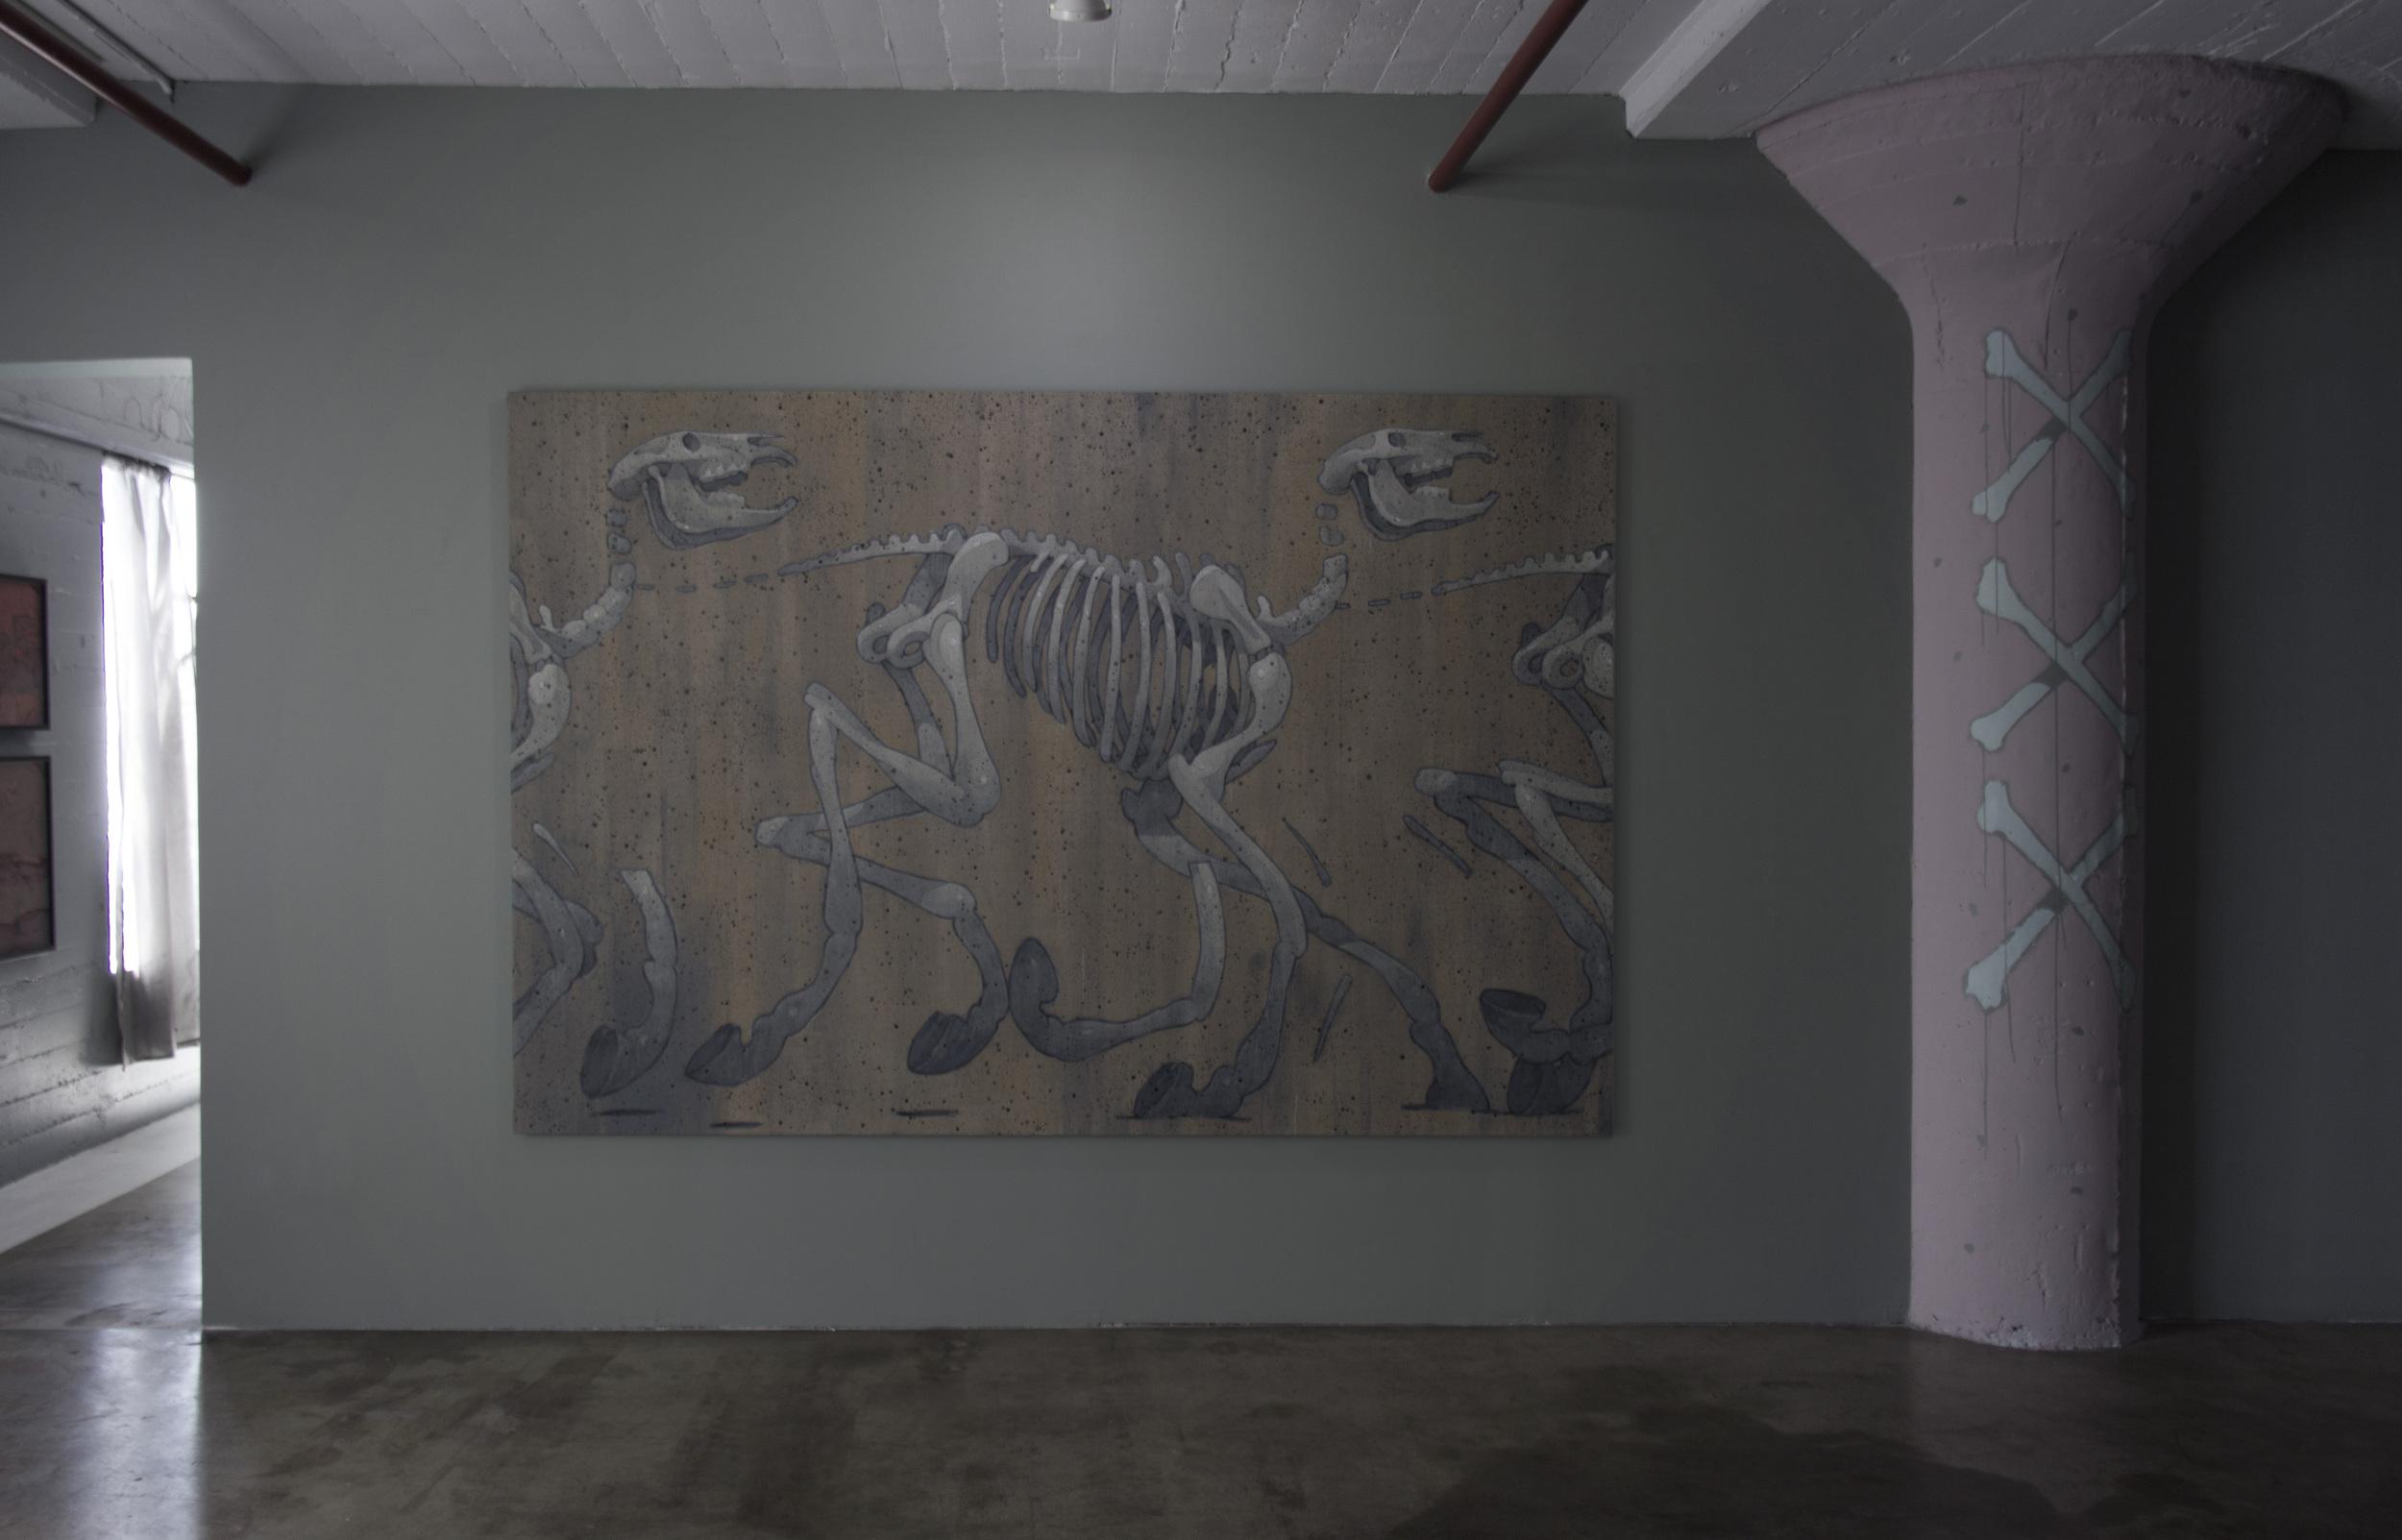 aryz-mural-graffiti-dionisio-arte-18